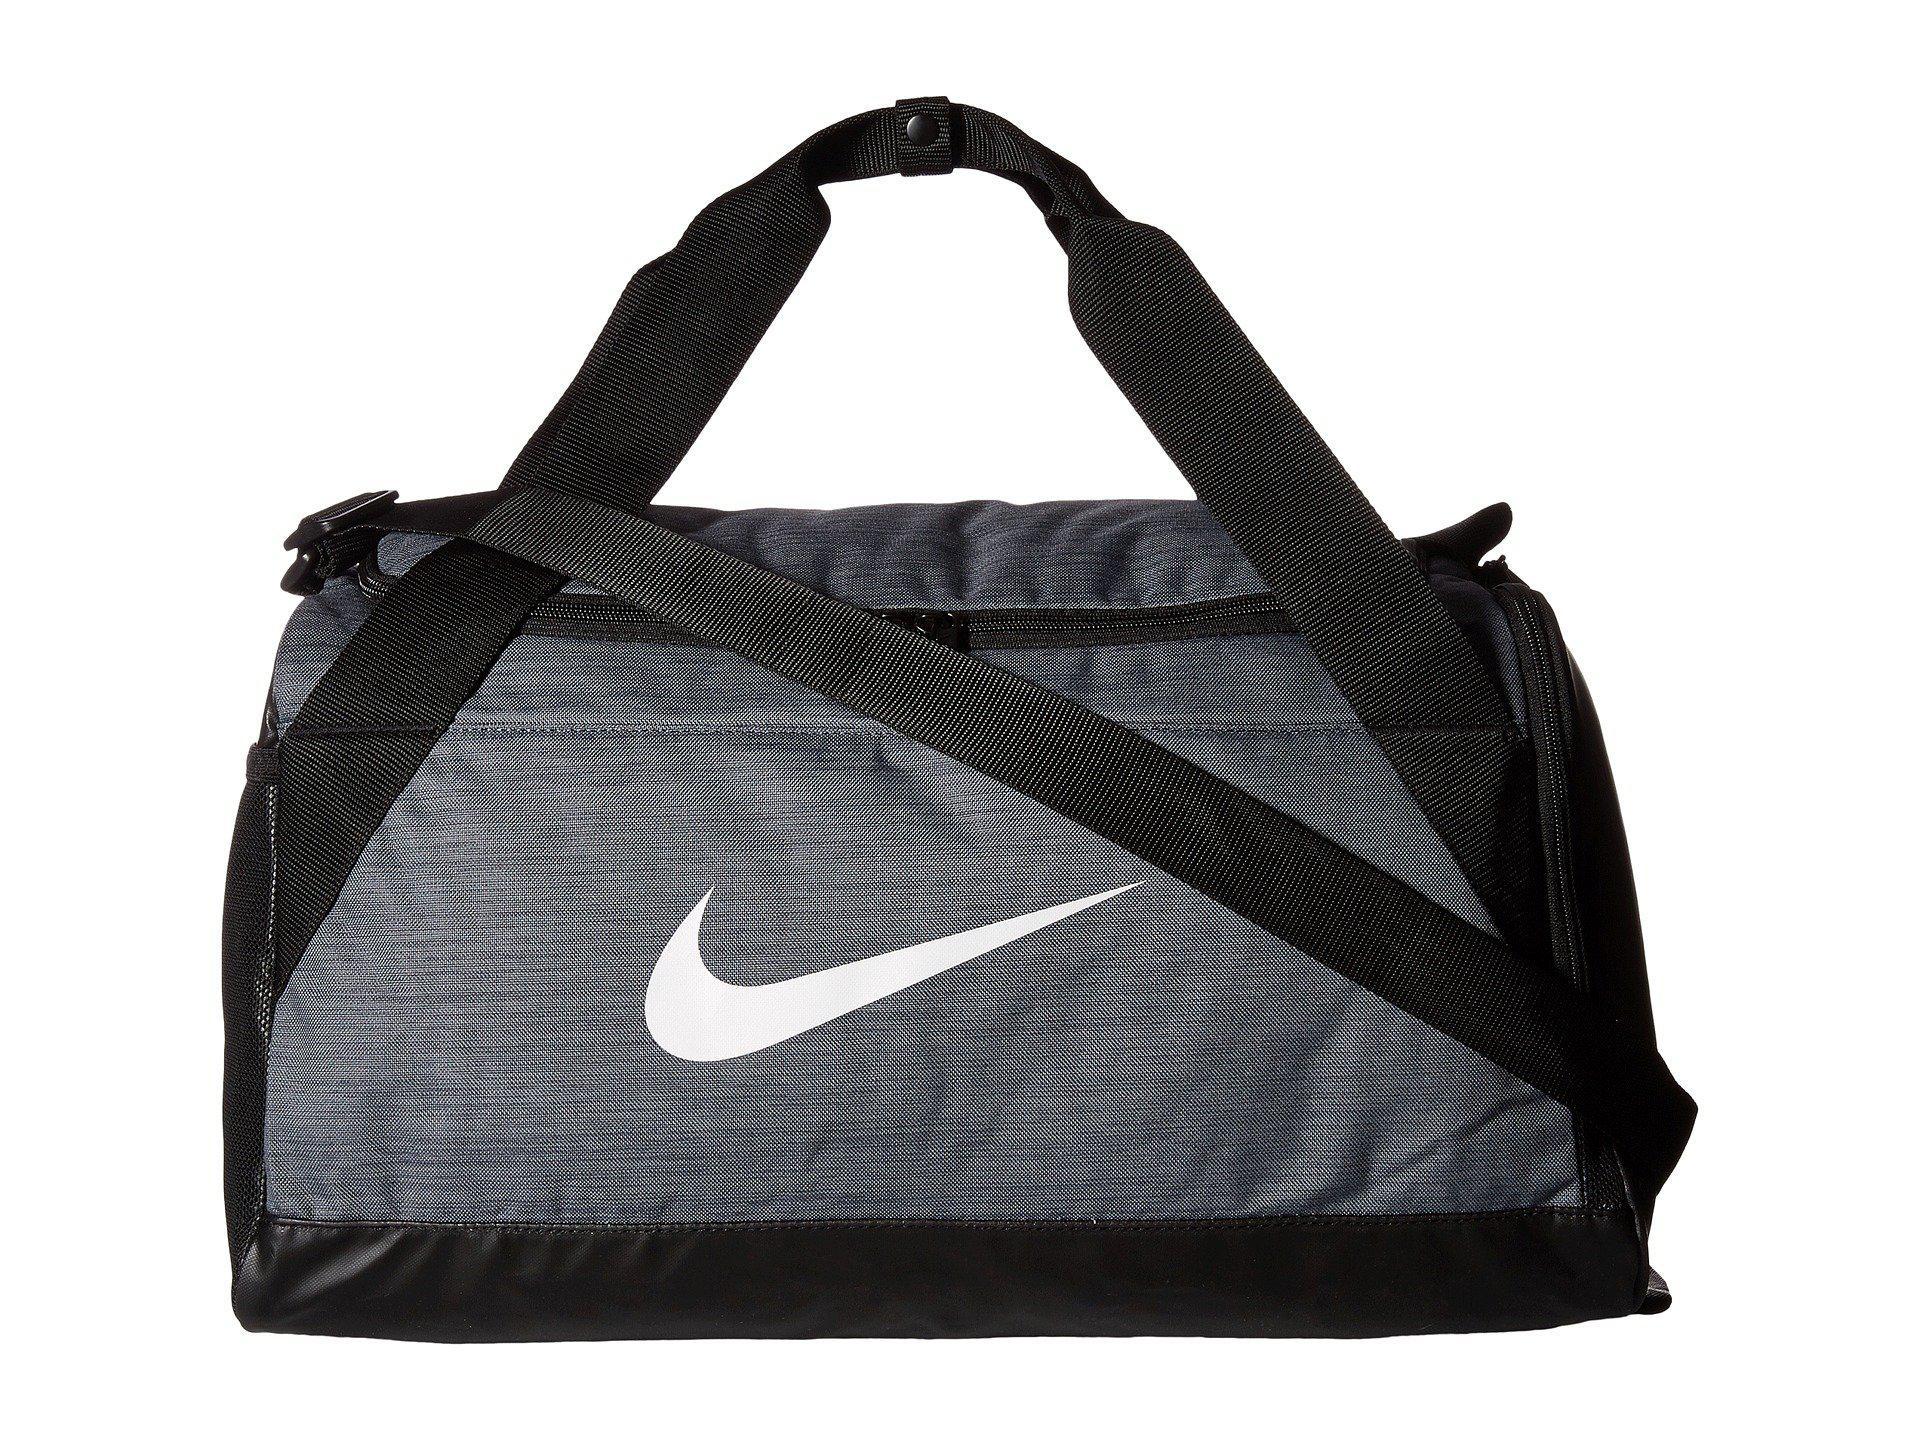 51401f22bcfd Lyst - Nike Brasilia Small Duffel Bag (black black white) Duffel ...